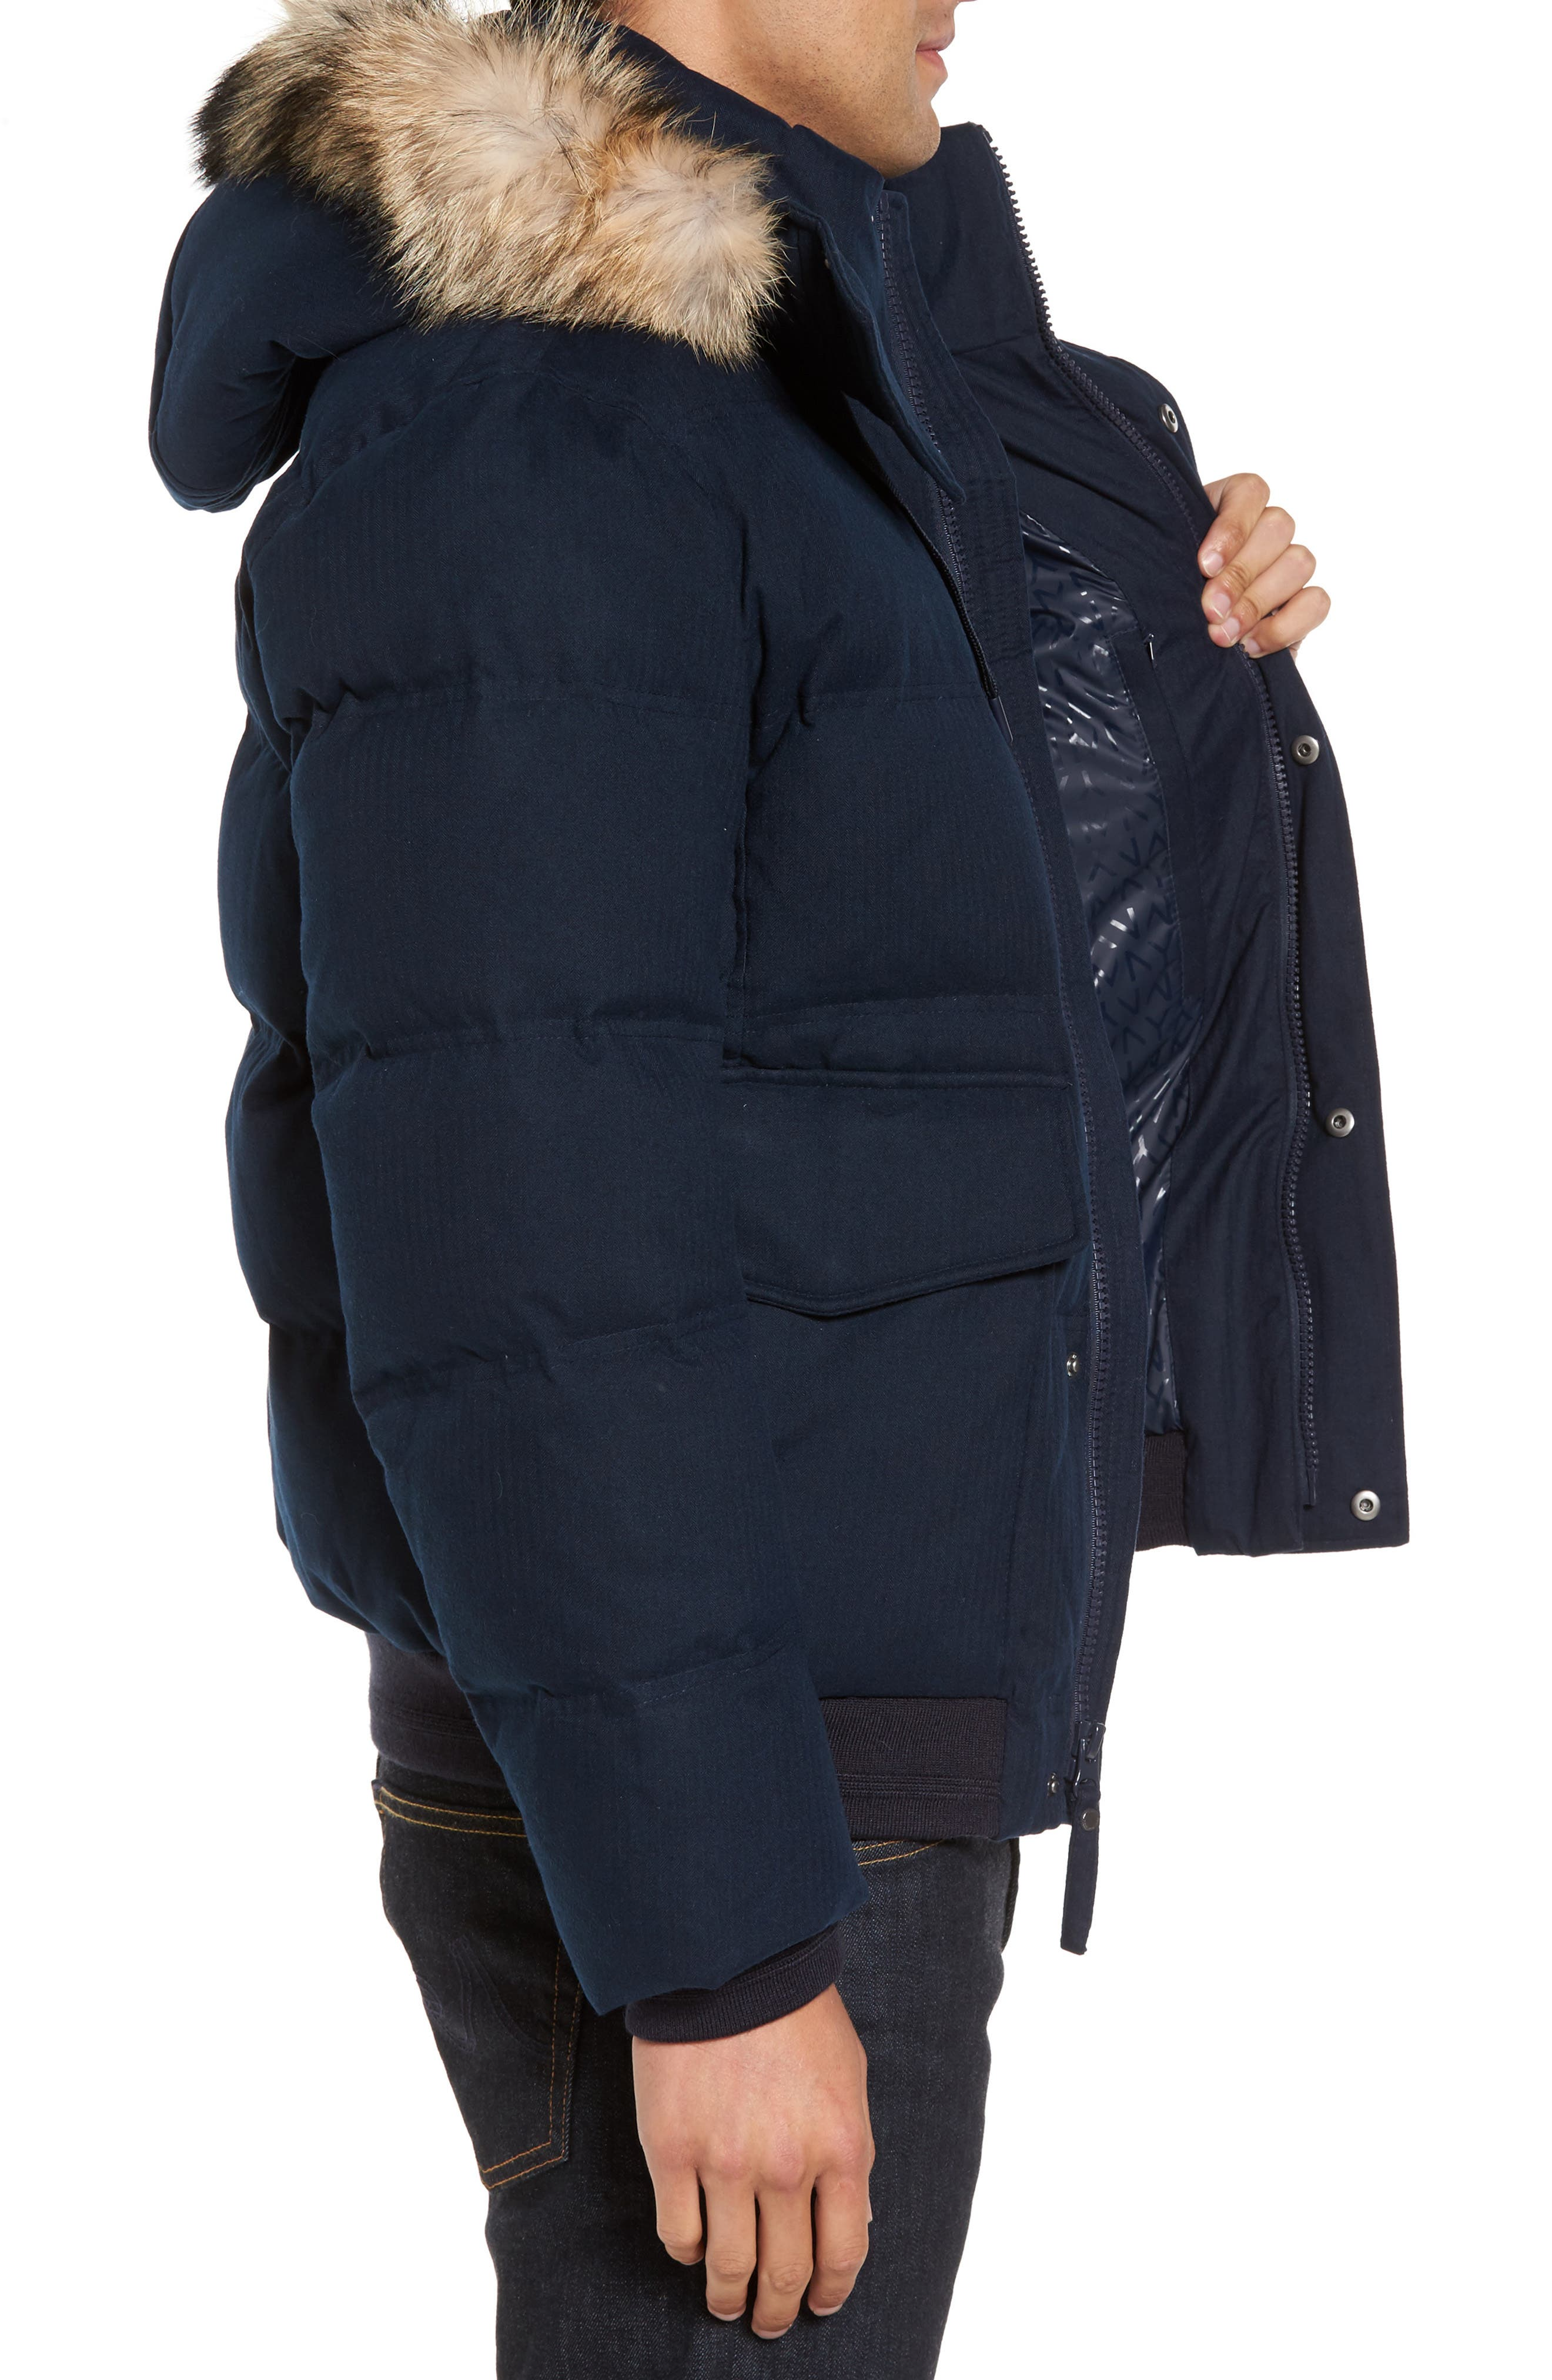 Alternate Image 3  - Marc New York Down Herringbone Jacket with Genuine Coyote Fur Trim